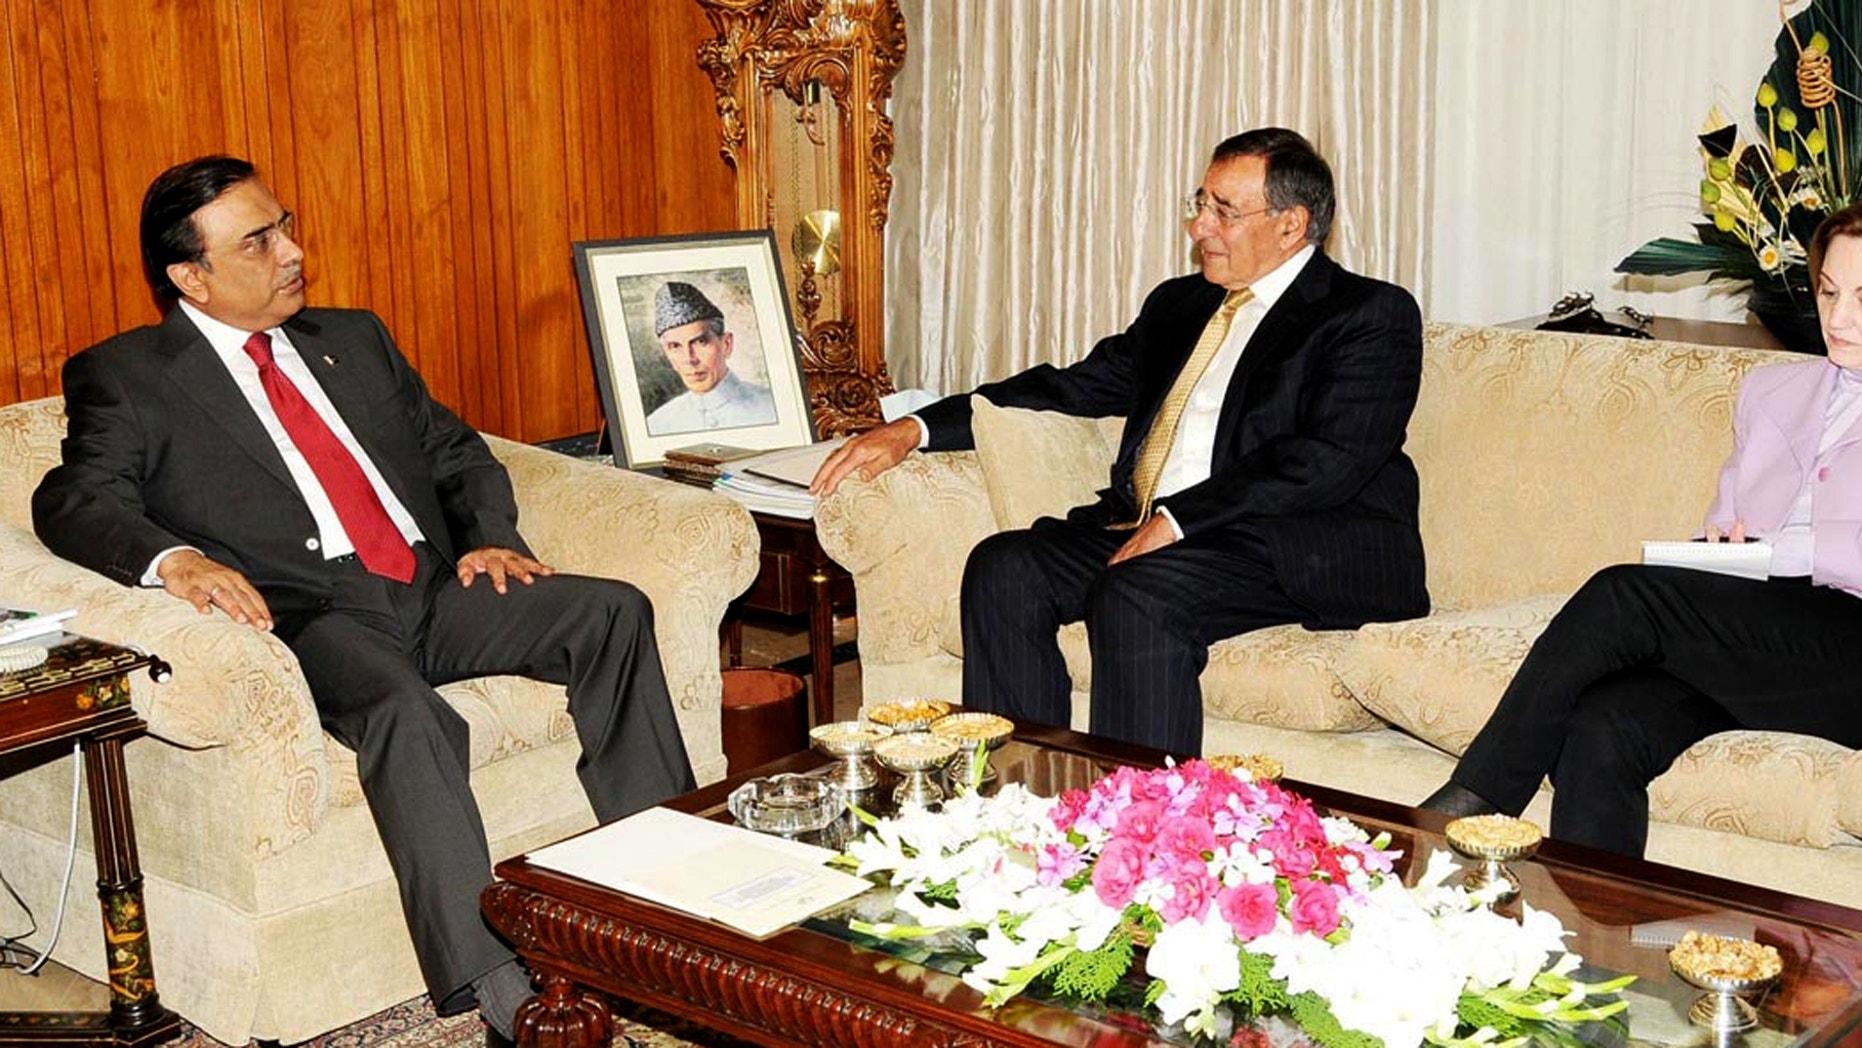 Spet. 30, 2012: Pakistan's President Asif Ali Zardari, left, meets Director of the US Central Intelligence Agency Leon Panetta in Islamabad, Pakistan.